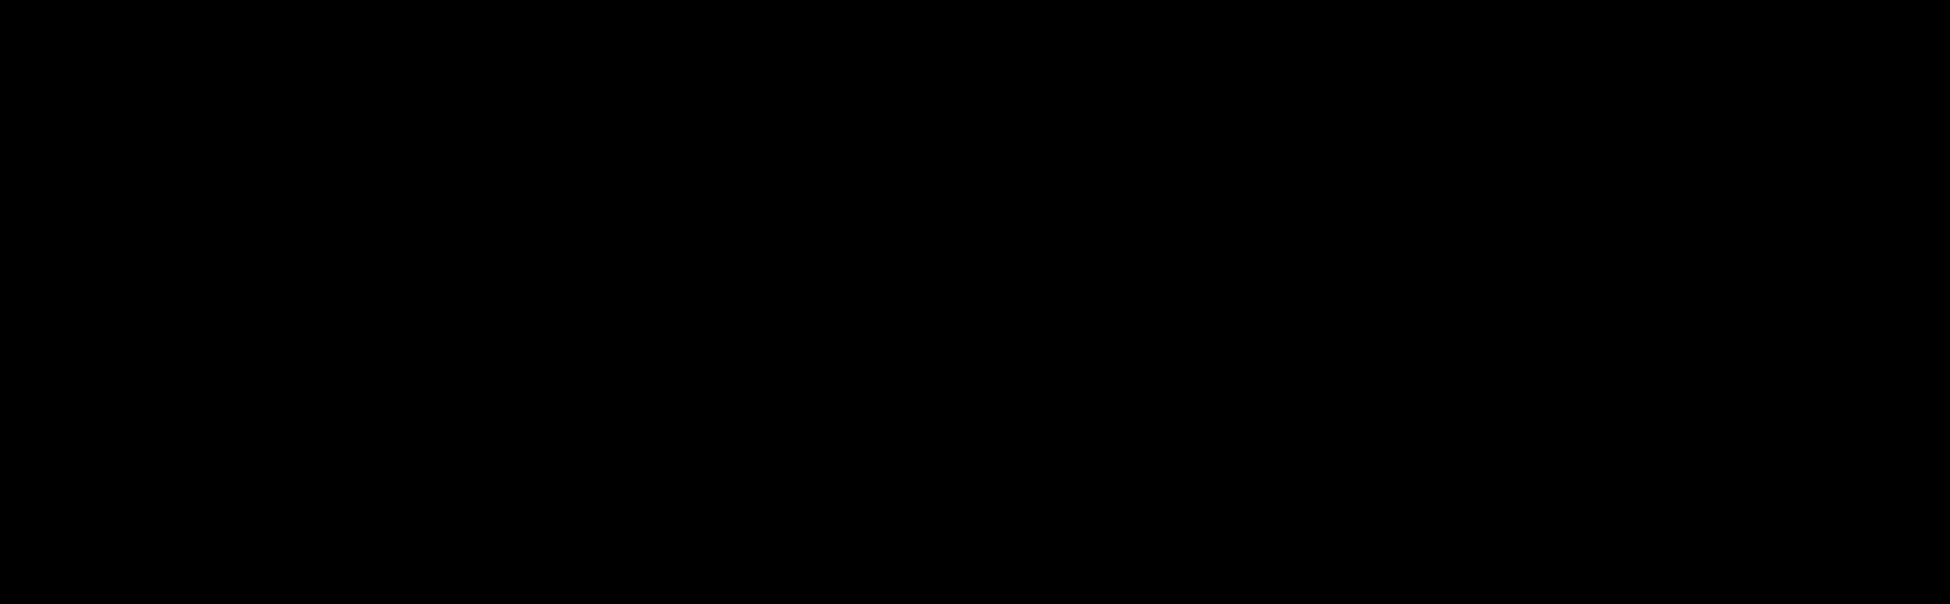 1950x604 Music Notes Clipart Quavers